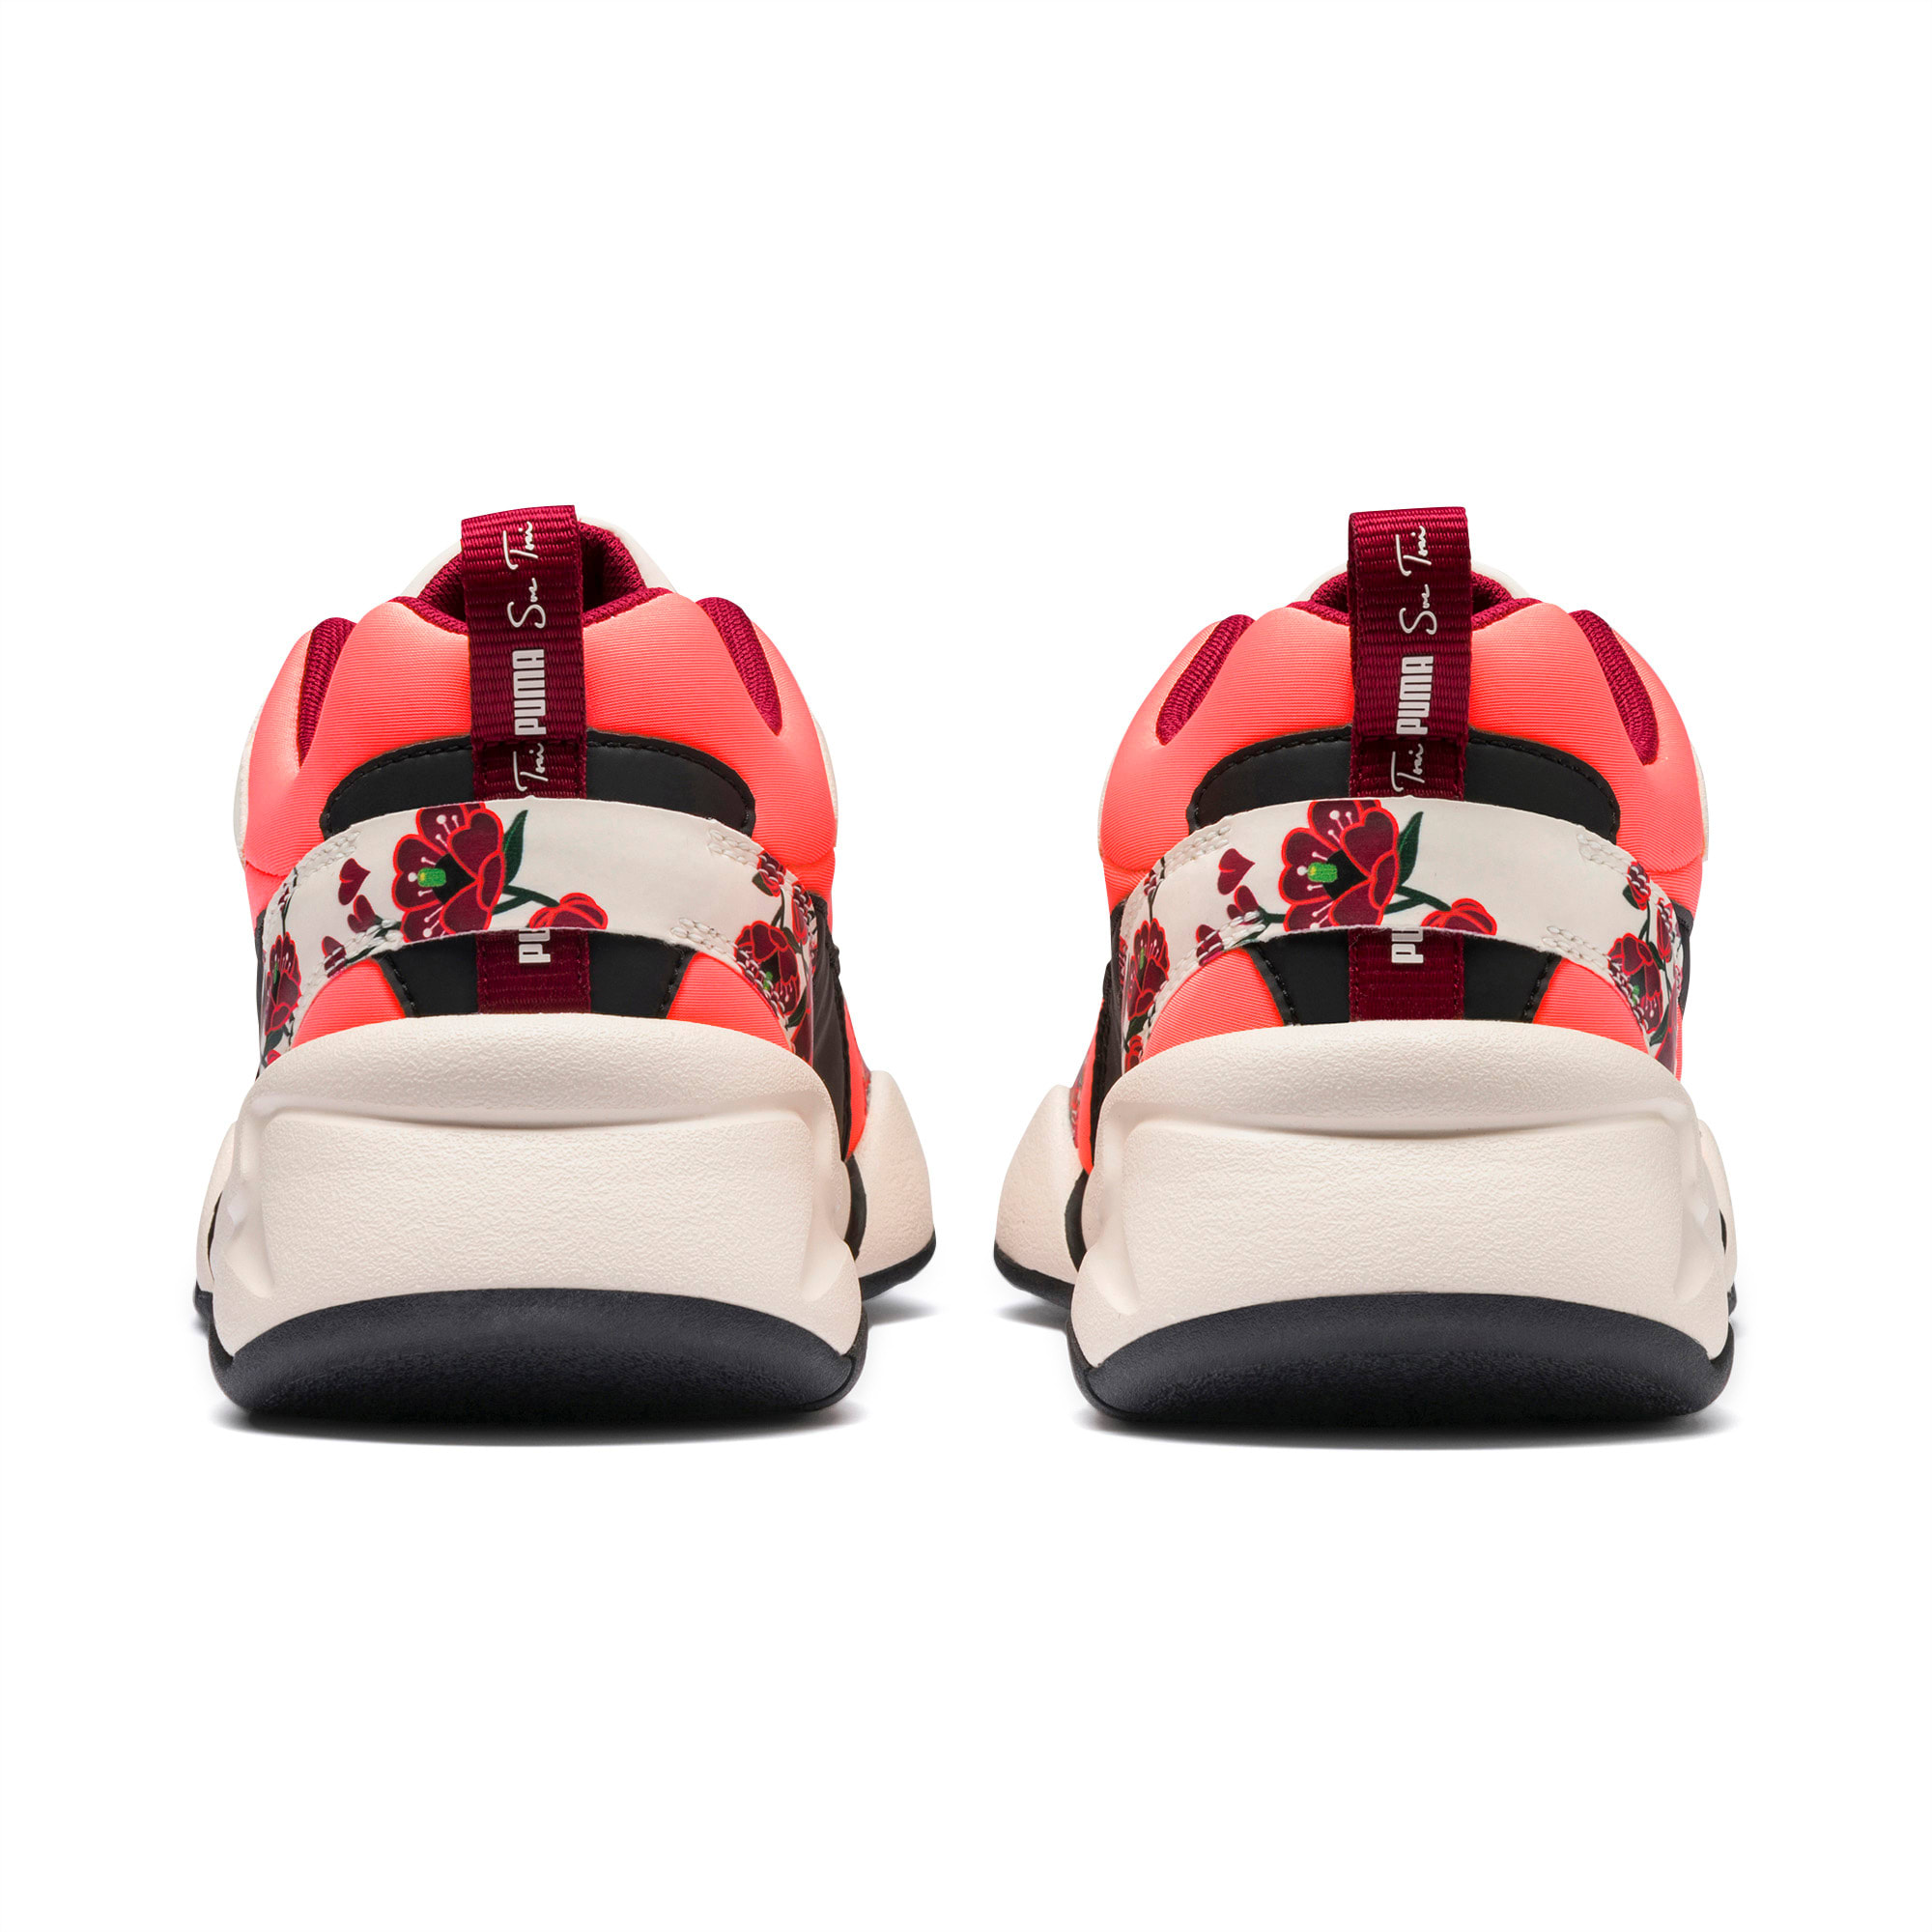 PUMA x SUE TSAI Nova Cherry Bombs træningssko til kvinder